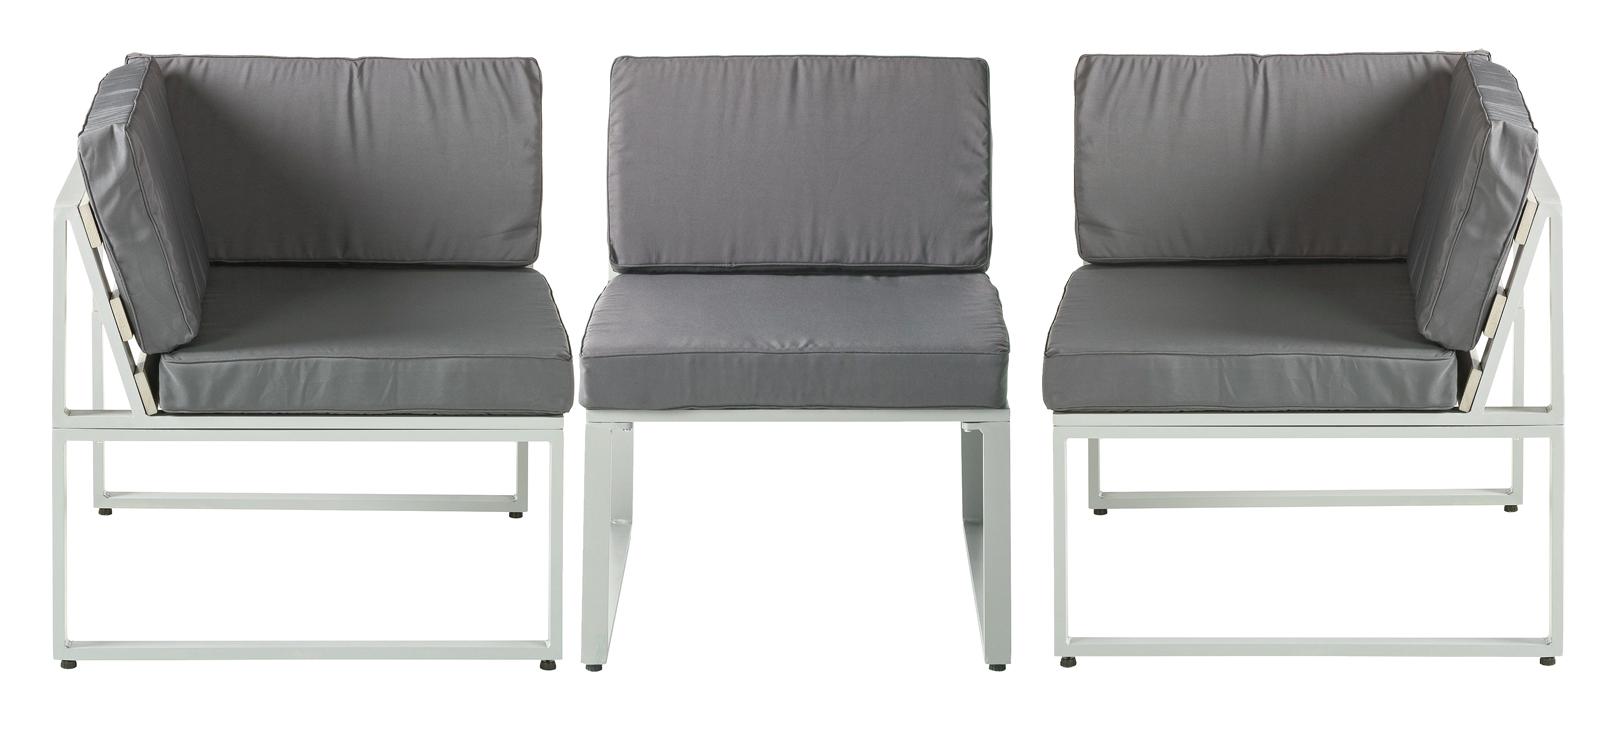 lounge ecke garten finest lounge ecke garten ziemlich garten lounge ecke with lounge ecke. Black Bedroom Furniture Sets. Home Design Ideas